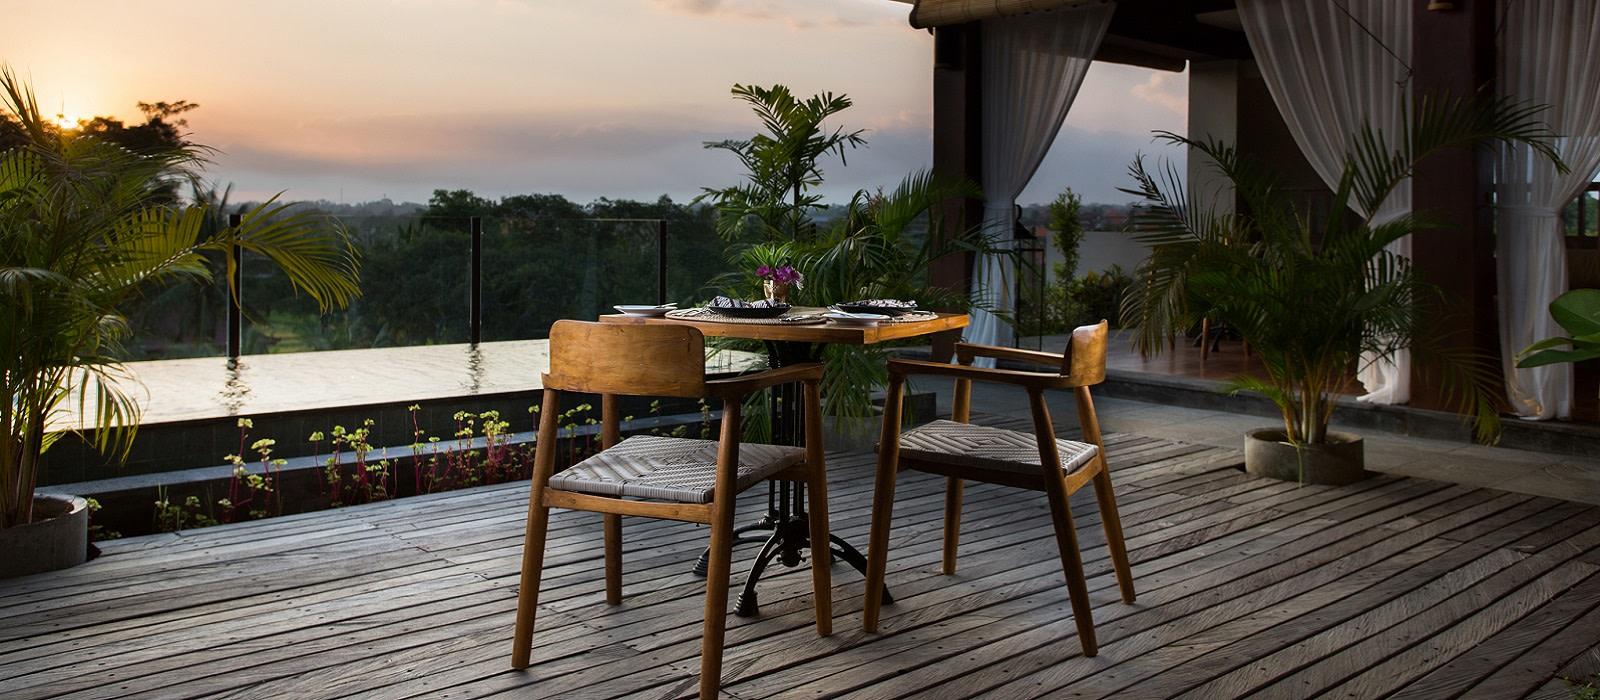 The Ubud Village Hotel In Indonesia Enchanting Travels